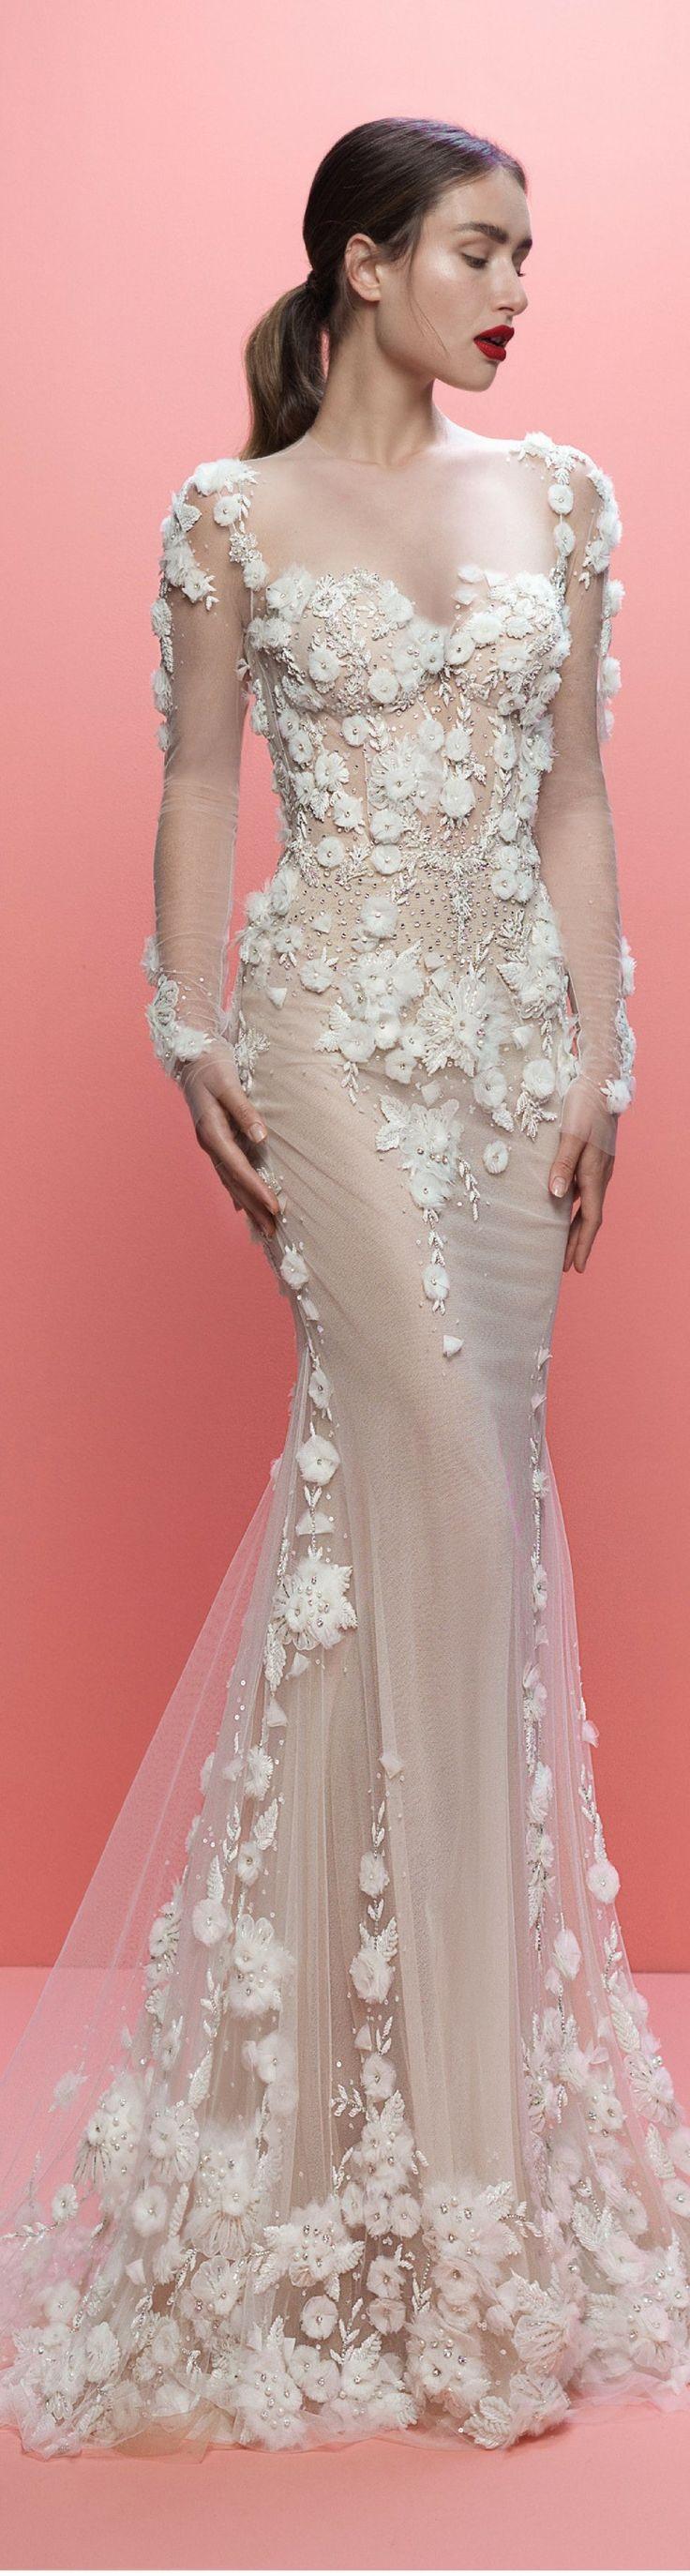 Moderno J Aton Couture Precios Del Vestido De Novia Modelo ...